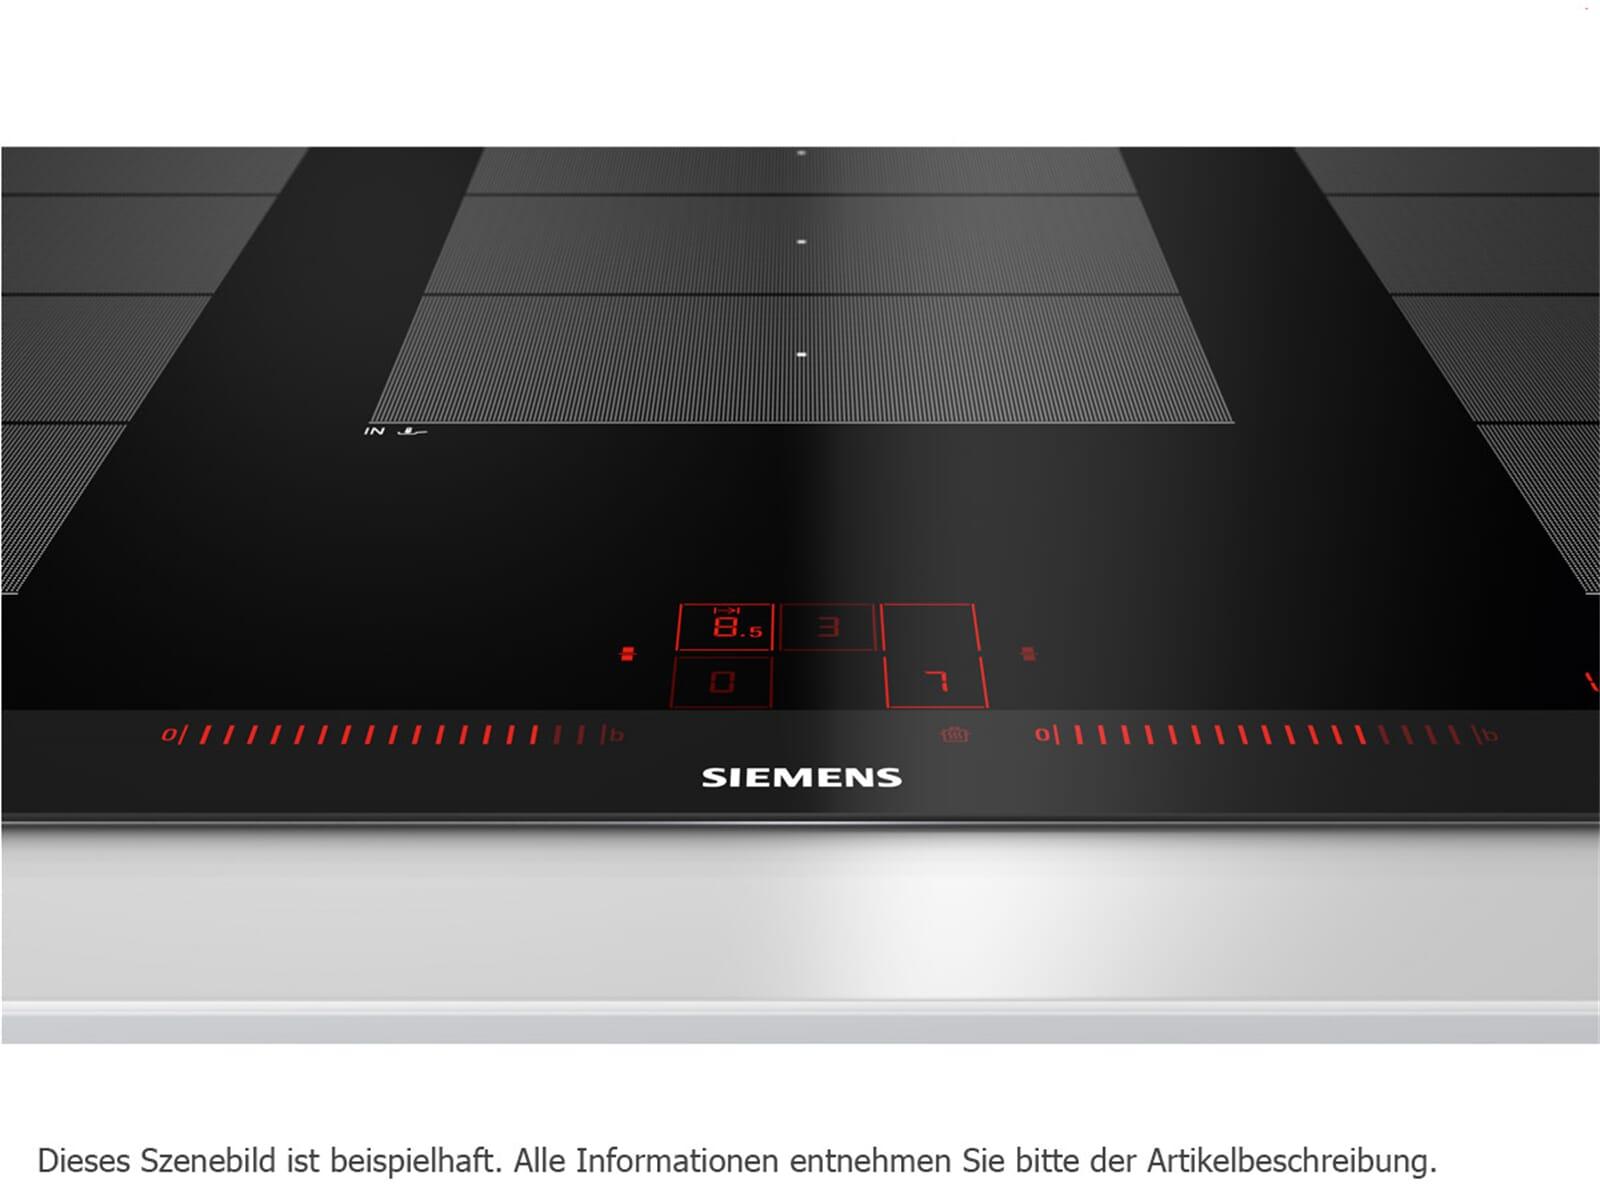 siemens ex975lxc1e induktion glaskeramik kochfeld autark f r 1098 90 eur. Black Bedroom Furniture Sets. Home Design Ideas